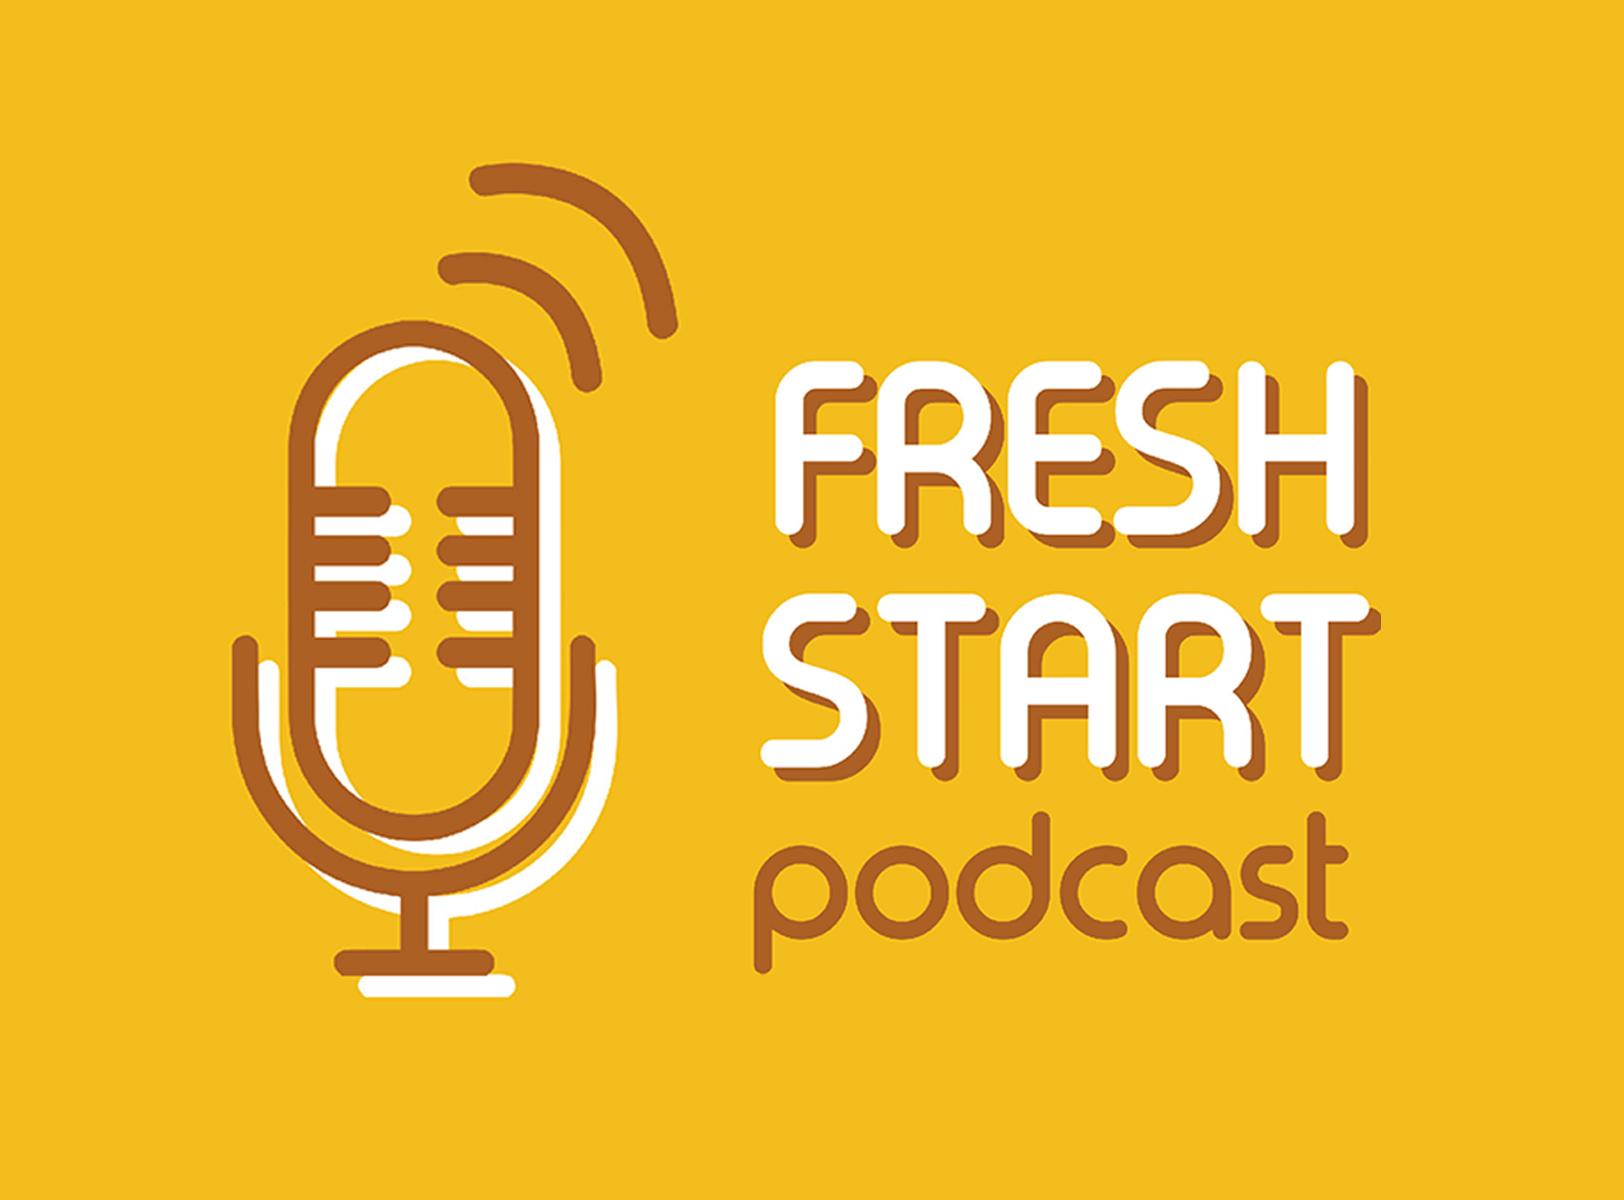 Fresh Start: Podcast News (6/28/2019 Fri.)